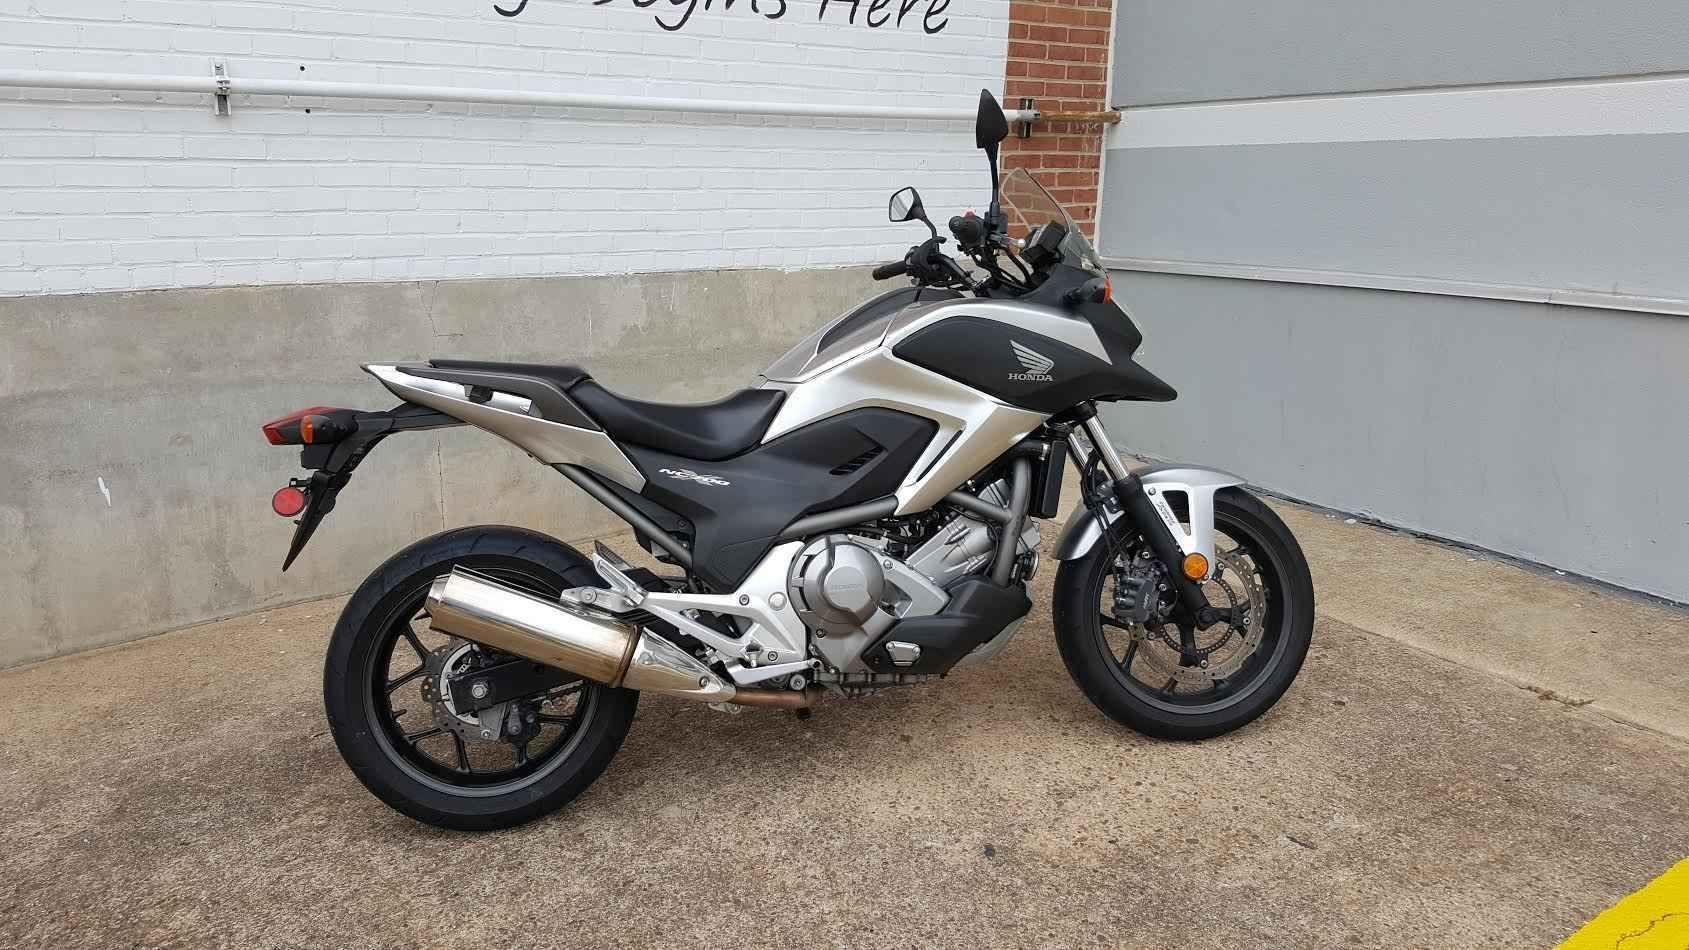 2013 honda nc 700x dct 2013 honda motorcycles for sale